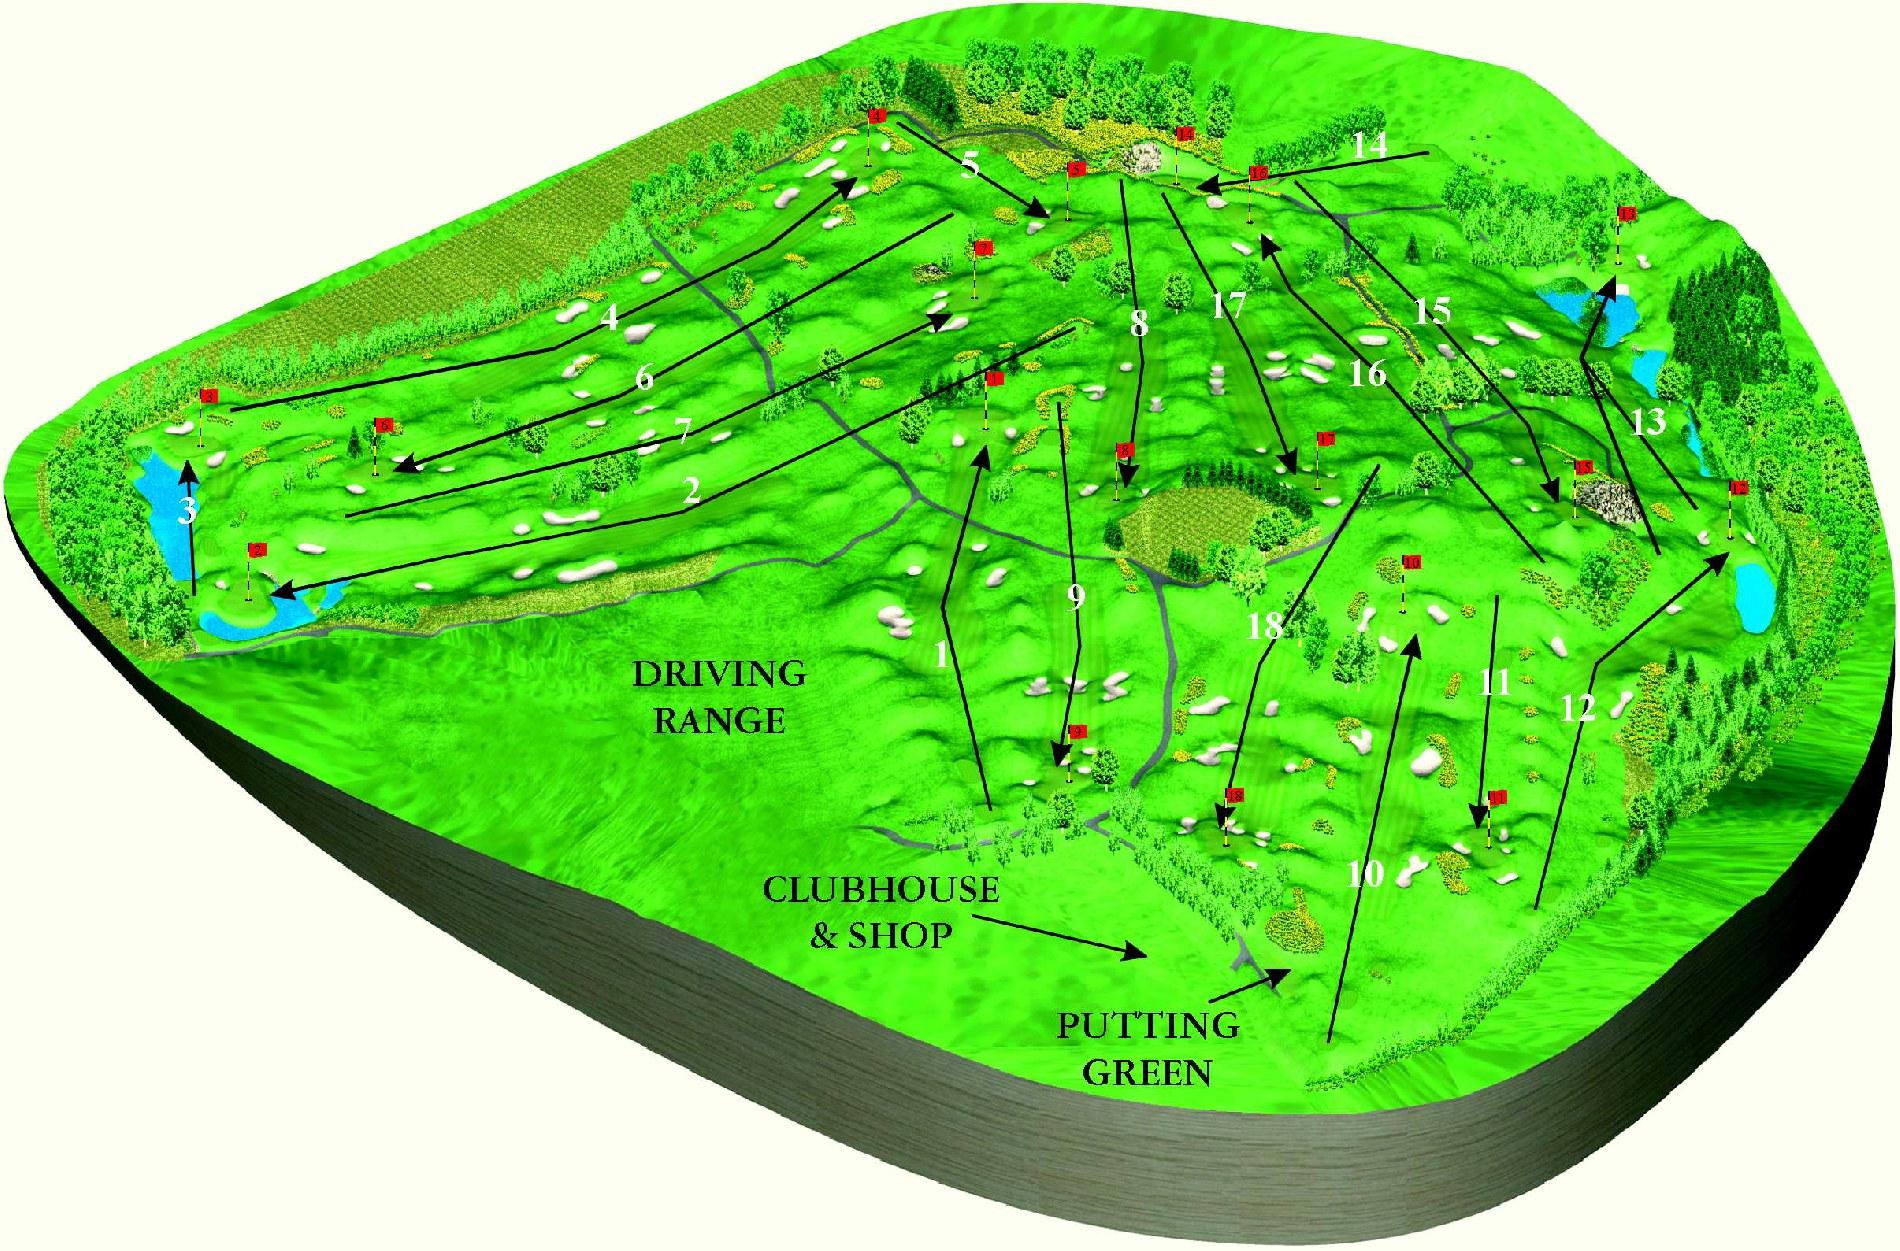 Druids Heath Golf Course Hole Course Wicklow Druids Glen Hotel - Us golf course map